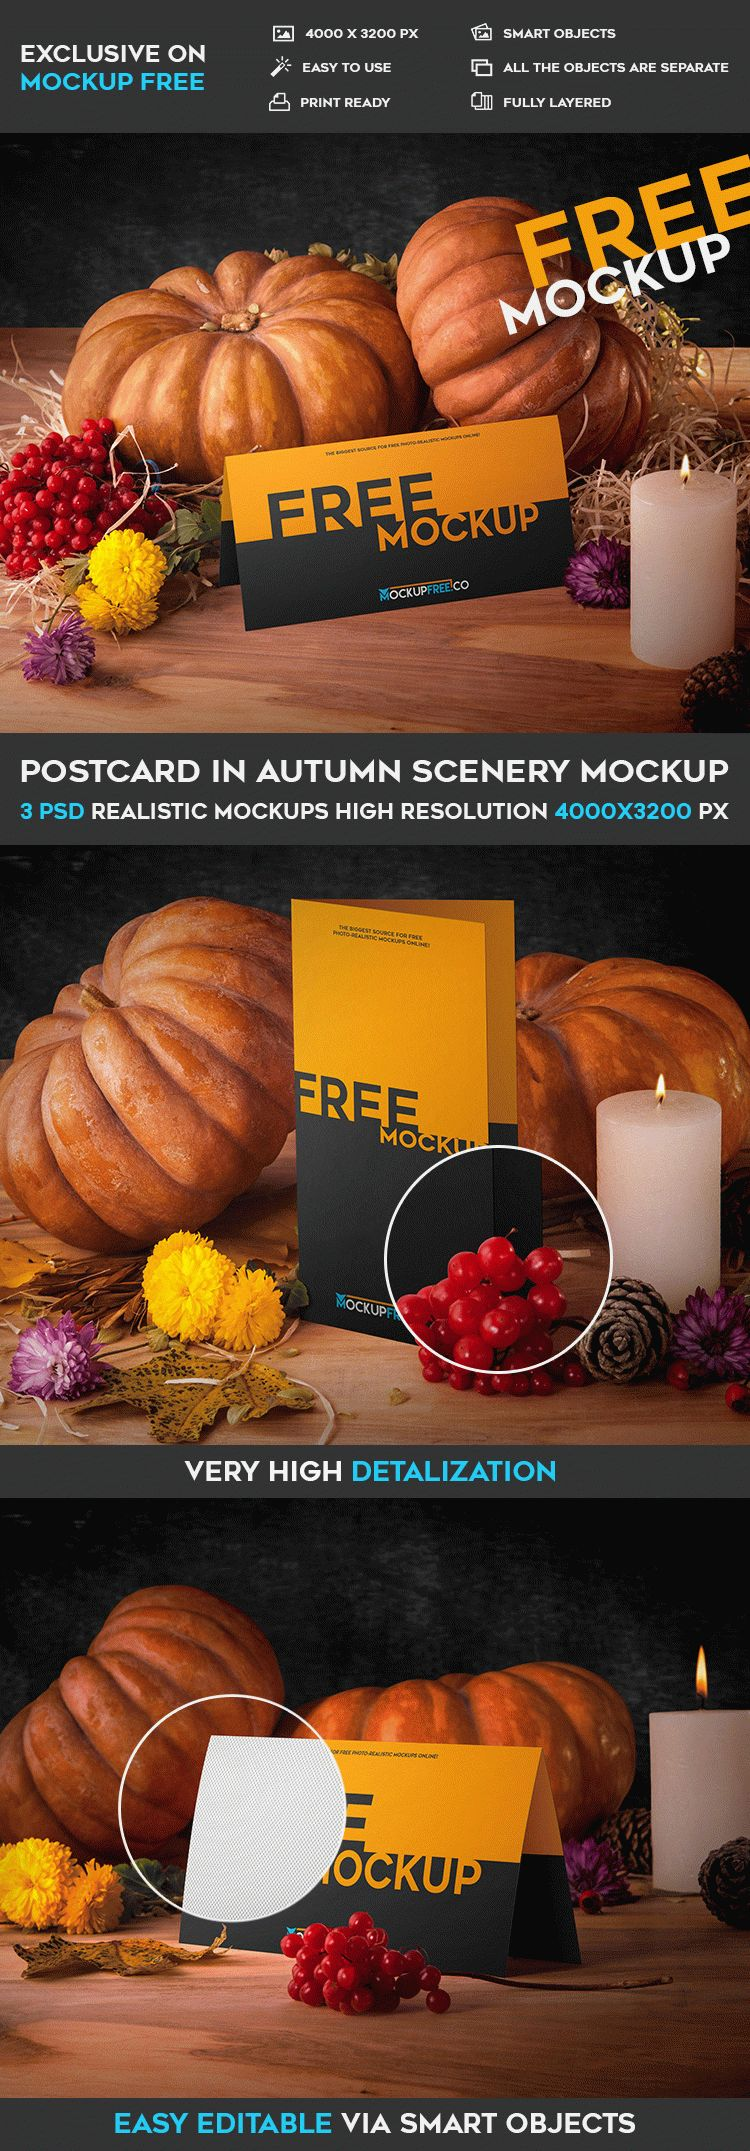 Postcard in Autumn Scenery – 3 Free PSD Mockups